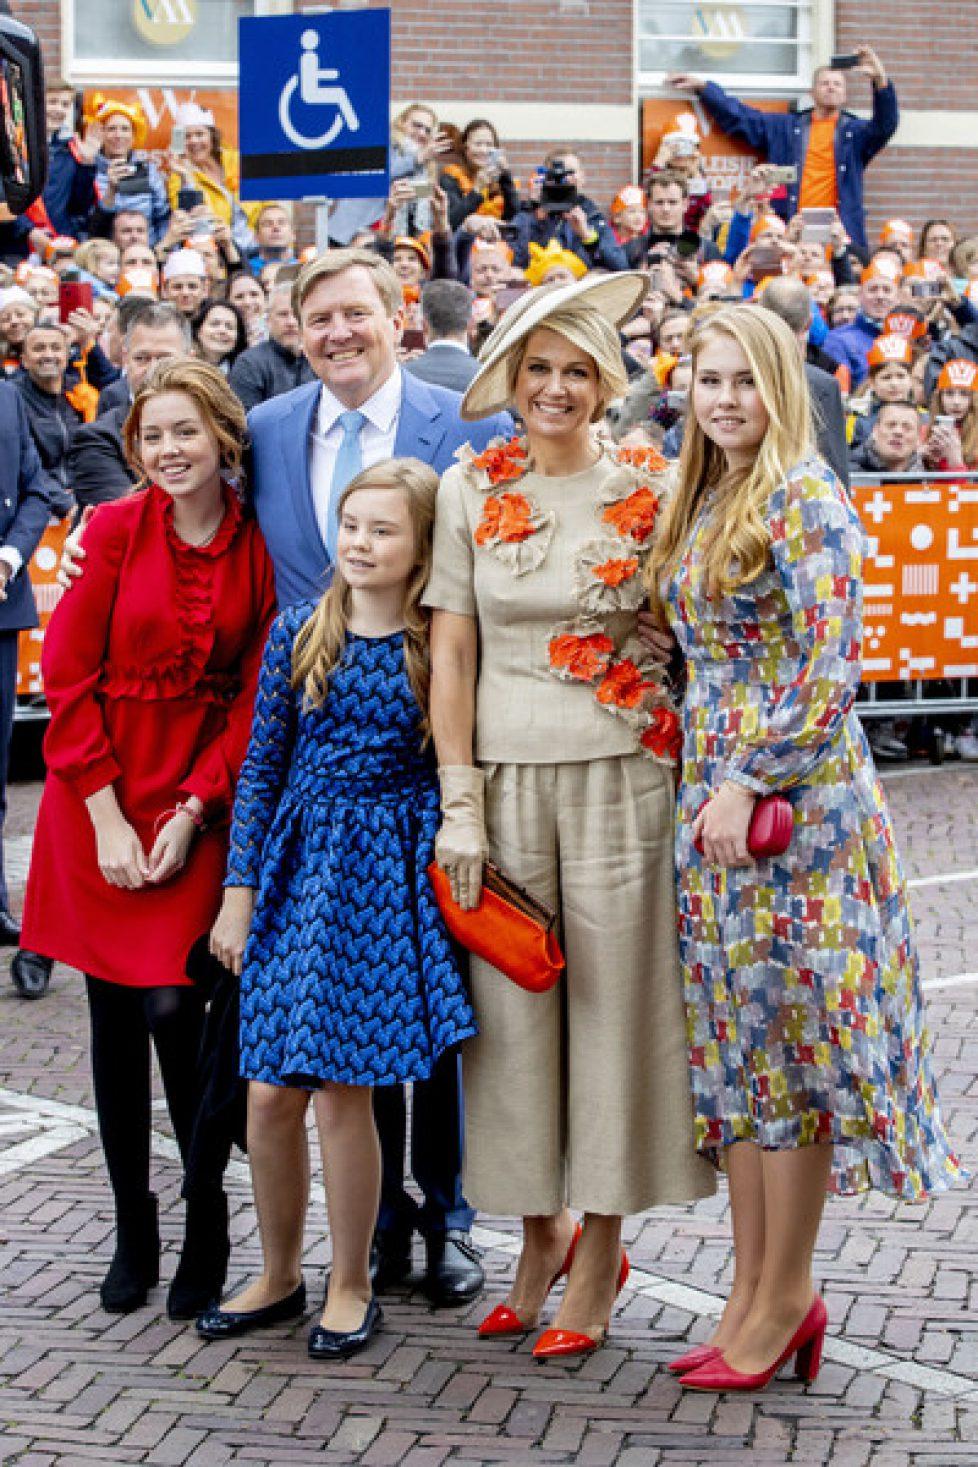 Dutch+Royal+Family+Attend+King+Day+Amersfoort+nXQkV0WGzVdl